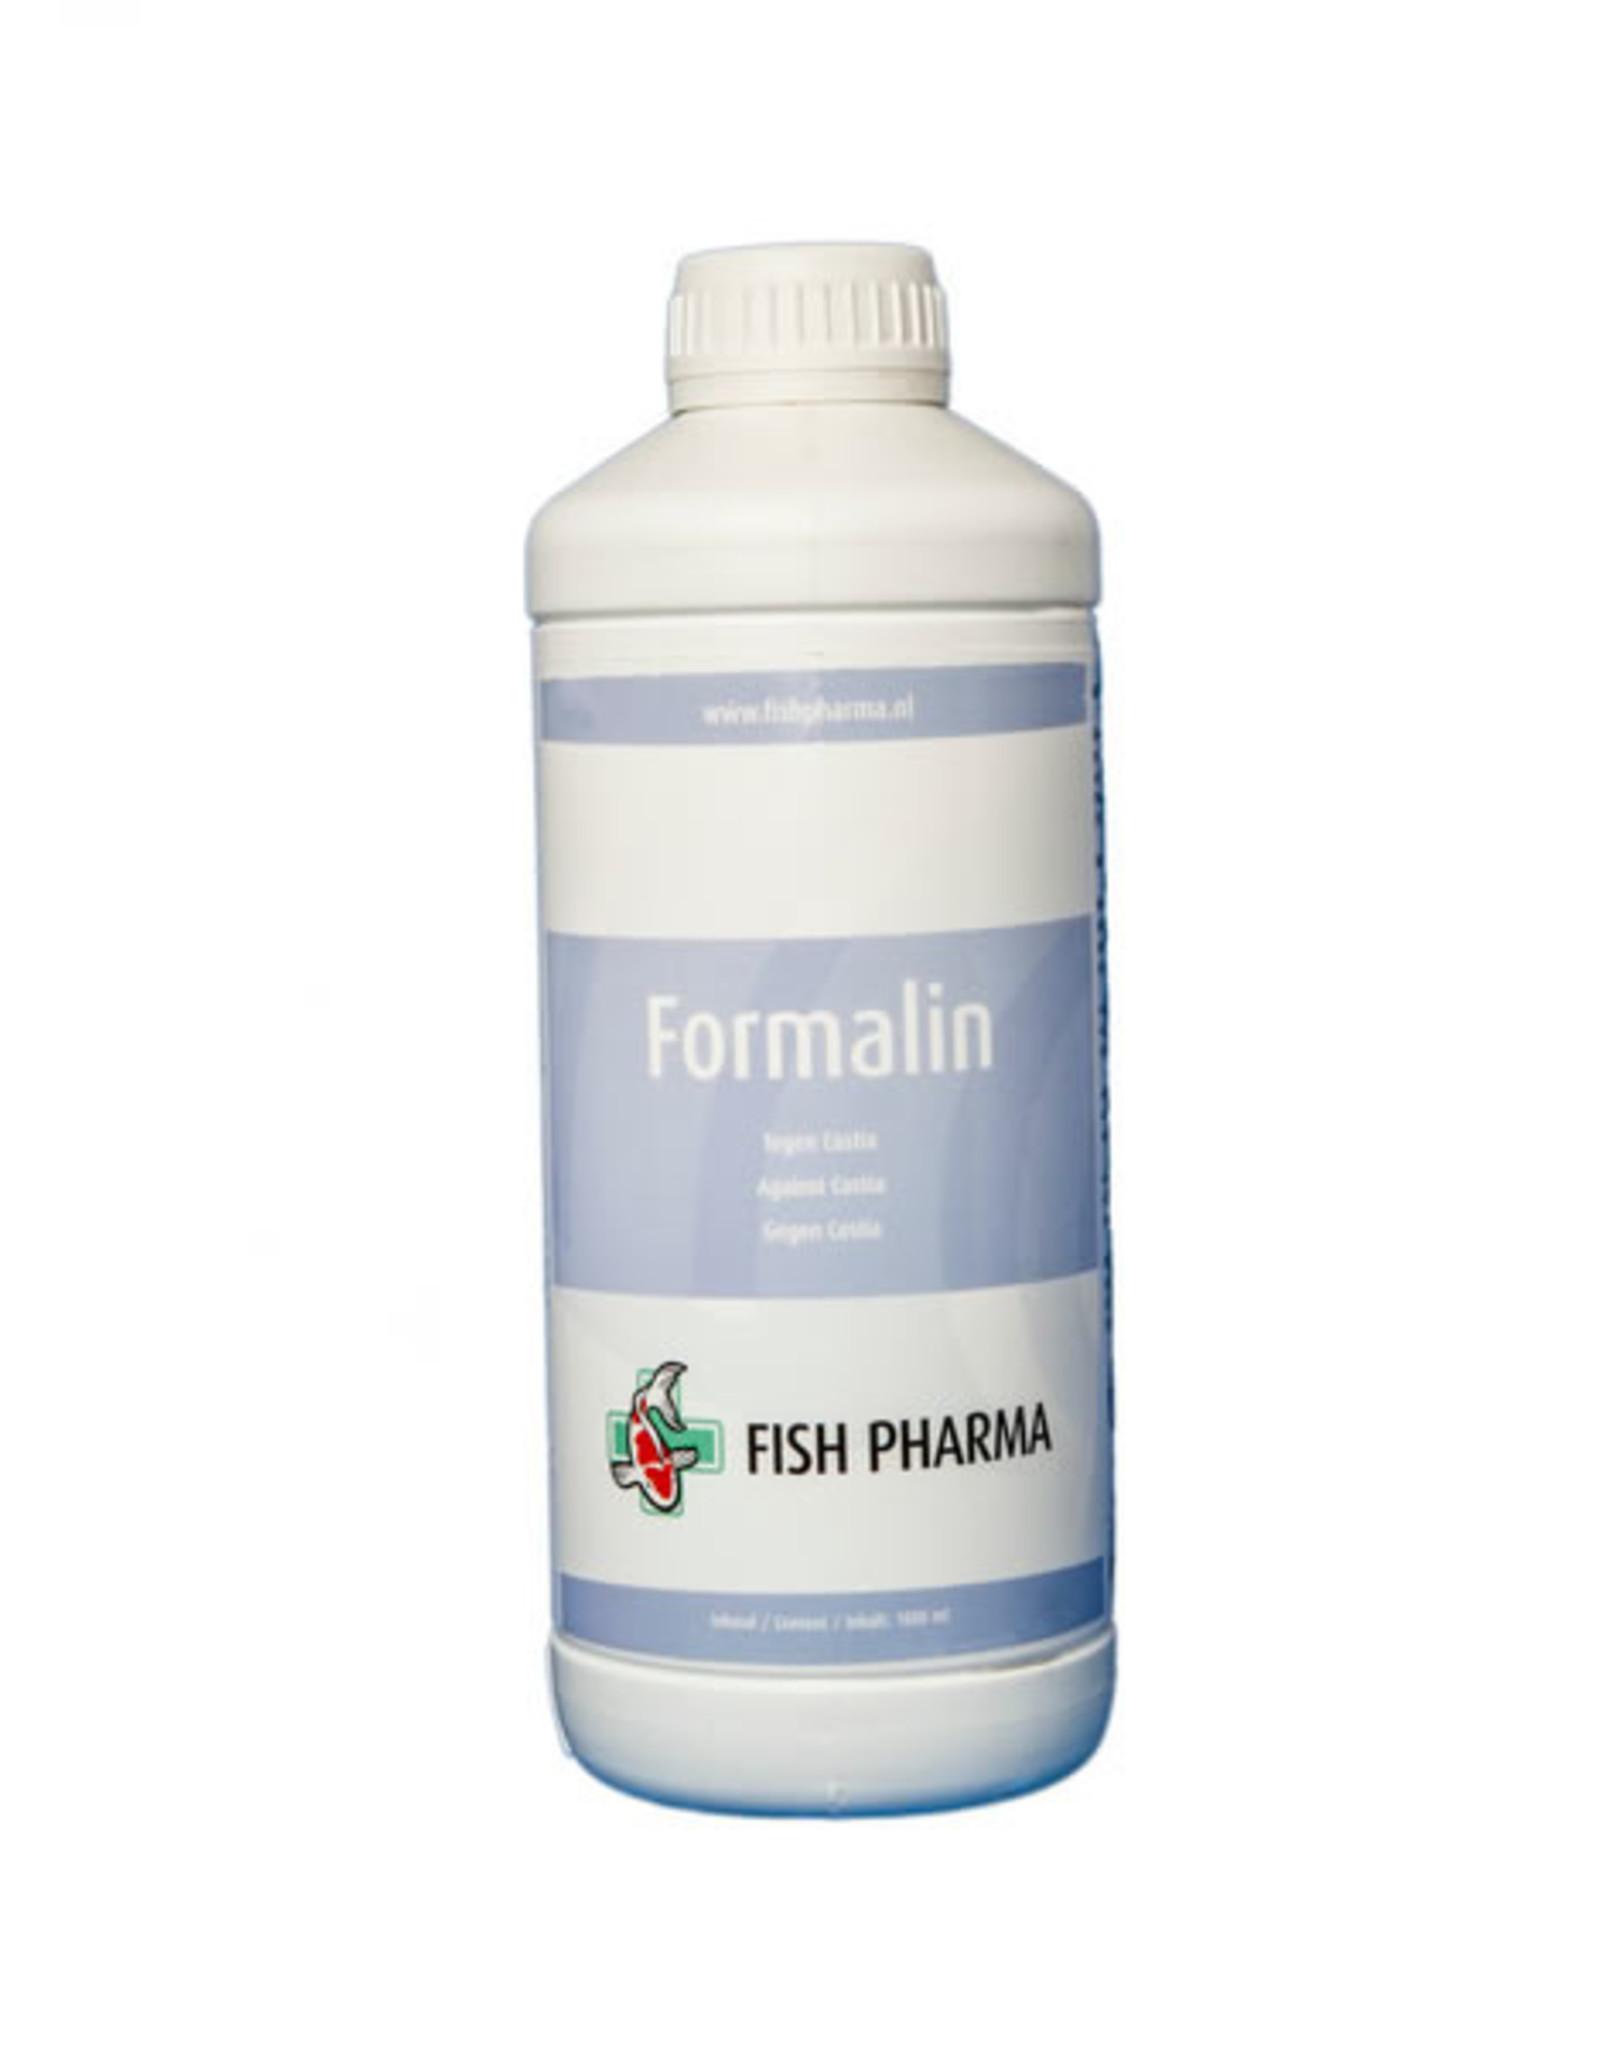 Fish Pharma Formalin against Costia